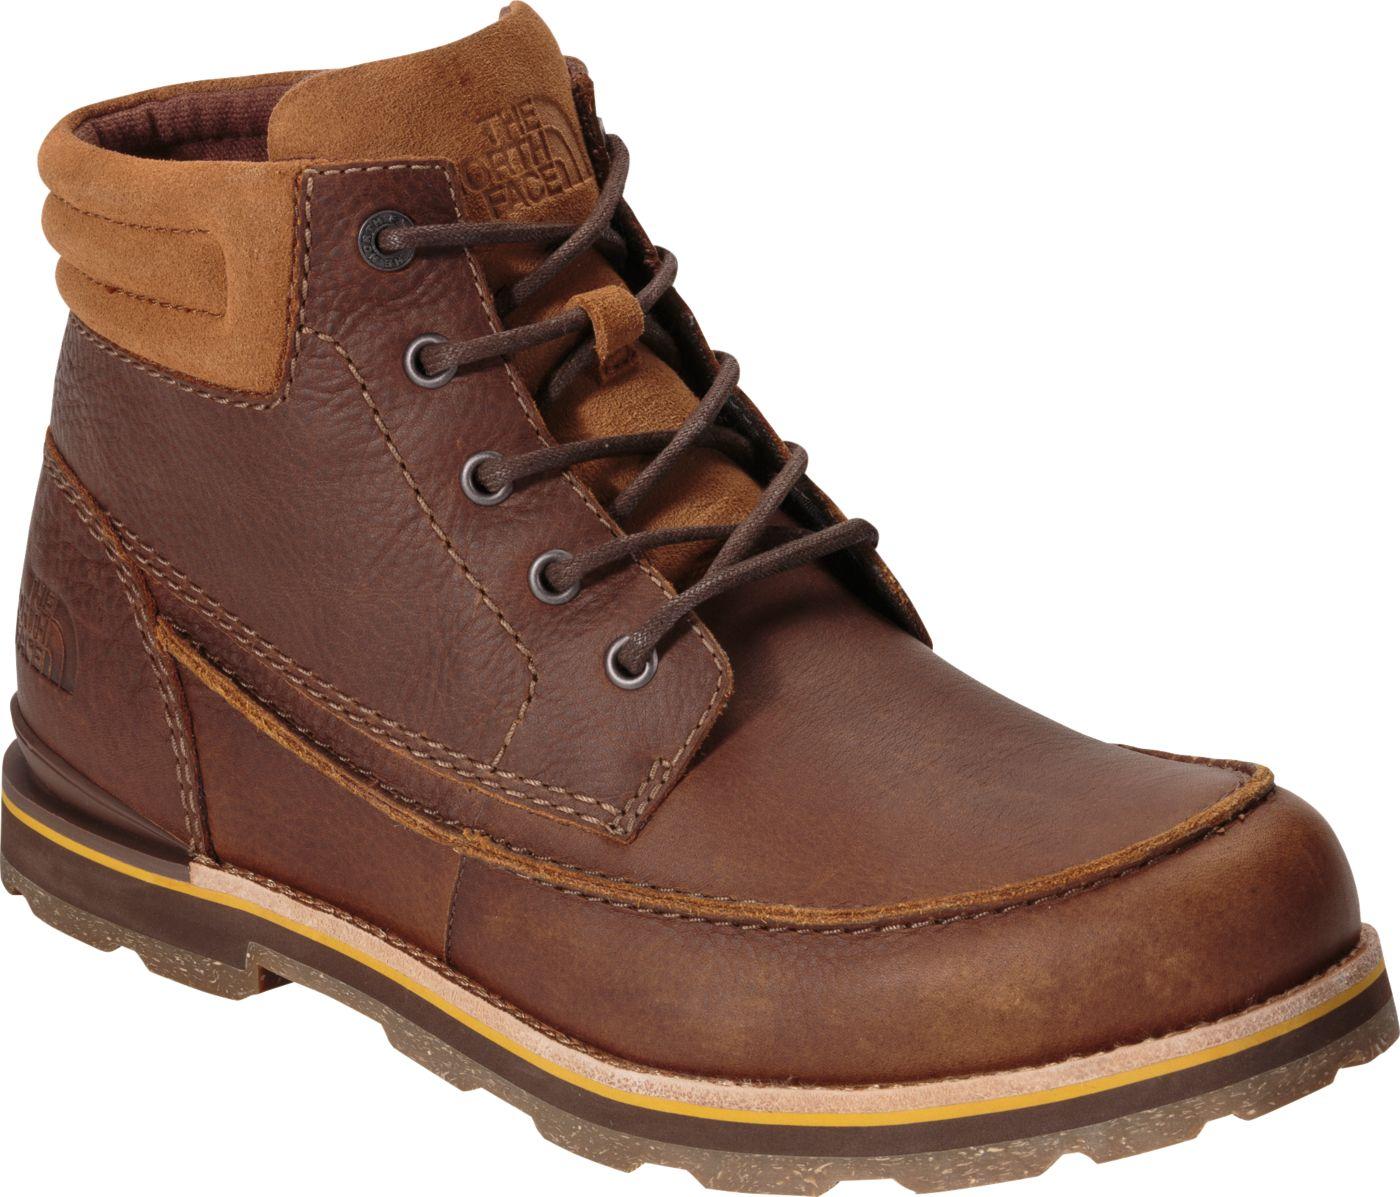 The North Face Men's Bridgeton Waterproof Chukka Boots